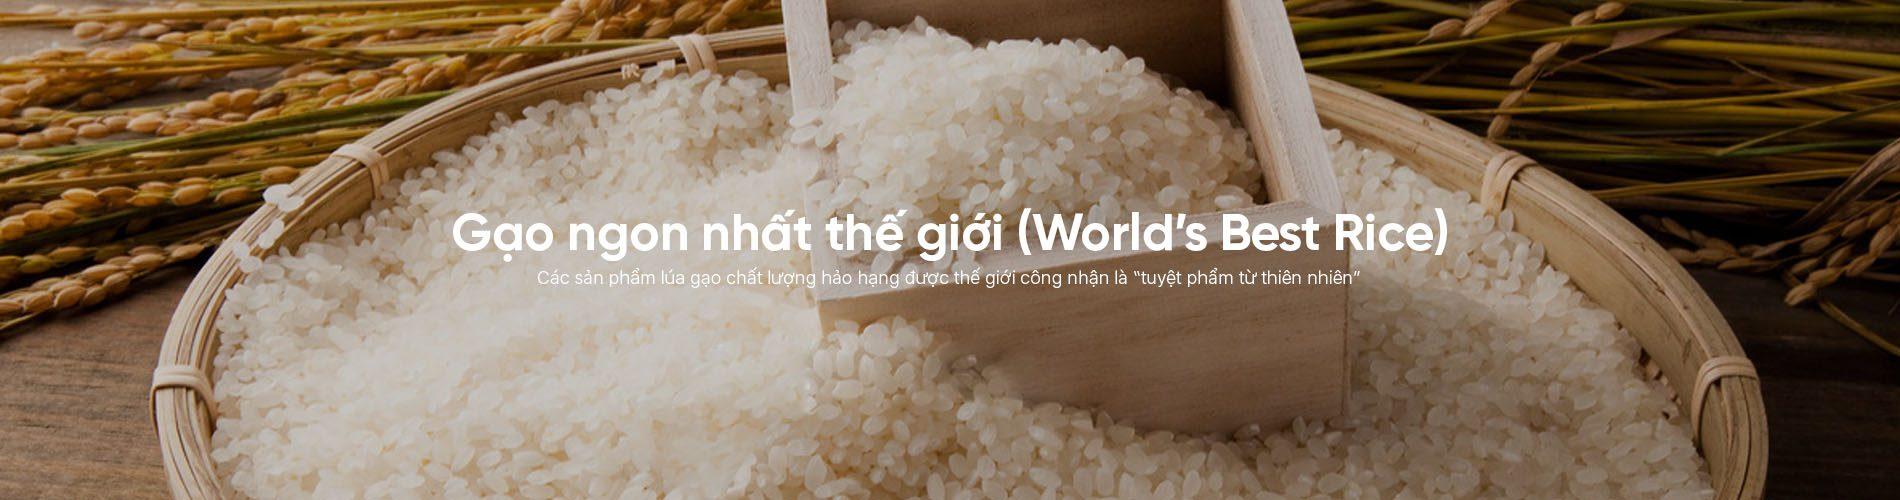 Gạo ngon nhất thế giới (World's Best Rice)